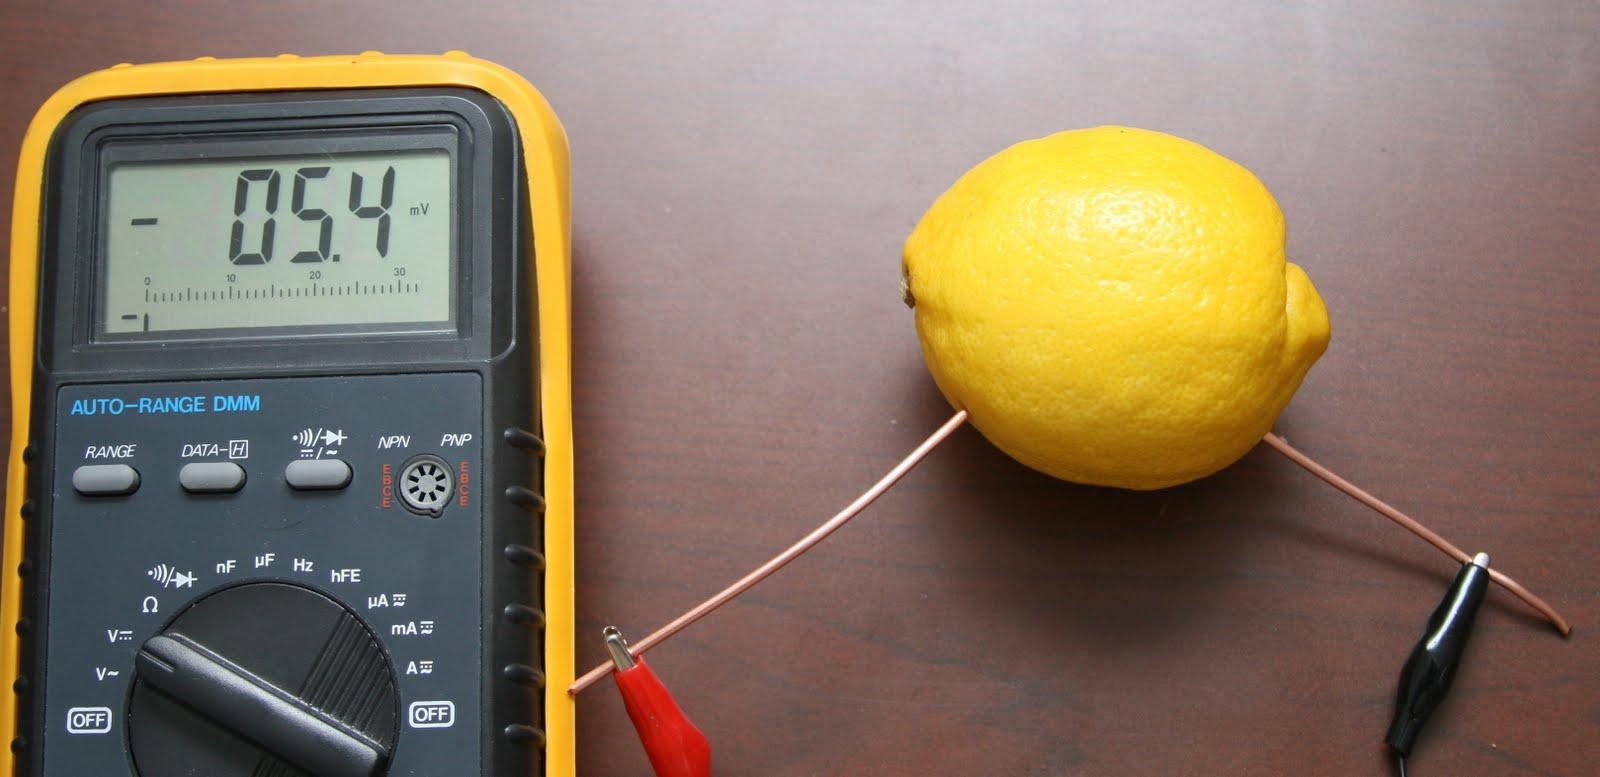 Lemon Circuit Zinc Graphite Worksheet And Wiring Diagram Electriccircuitprojectideas Electric Science Project Joel Avrunin S Effective Bits Of Knowledge Batteries From Lemons Rh Effectivebits Net Build A Paper